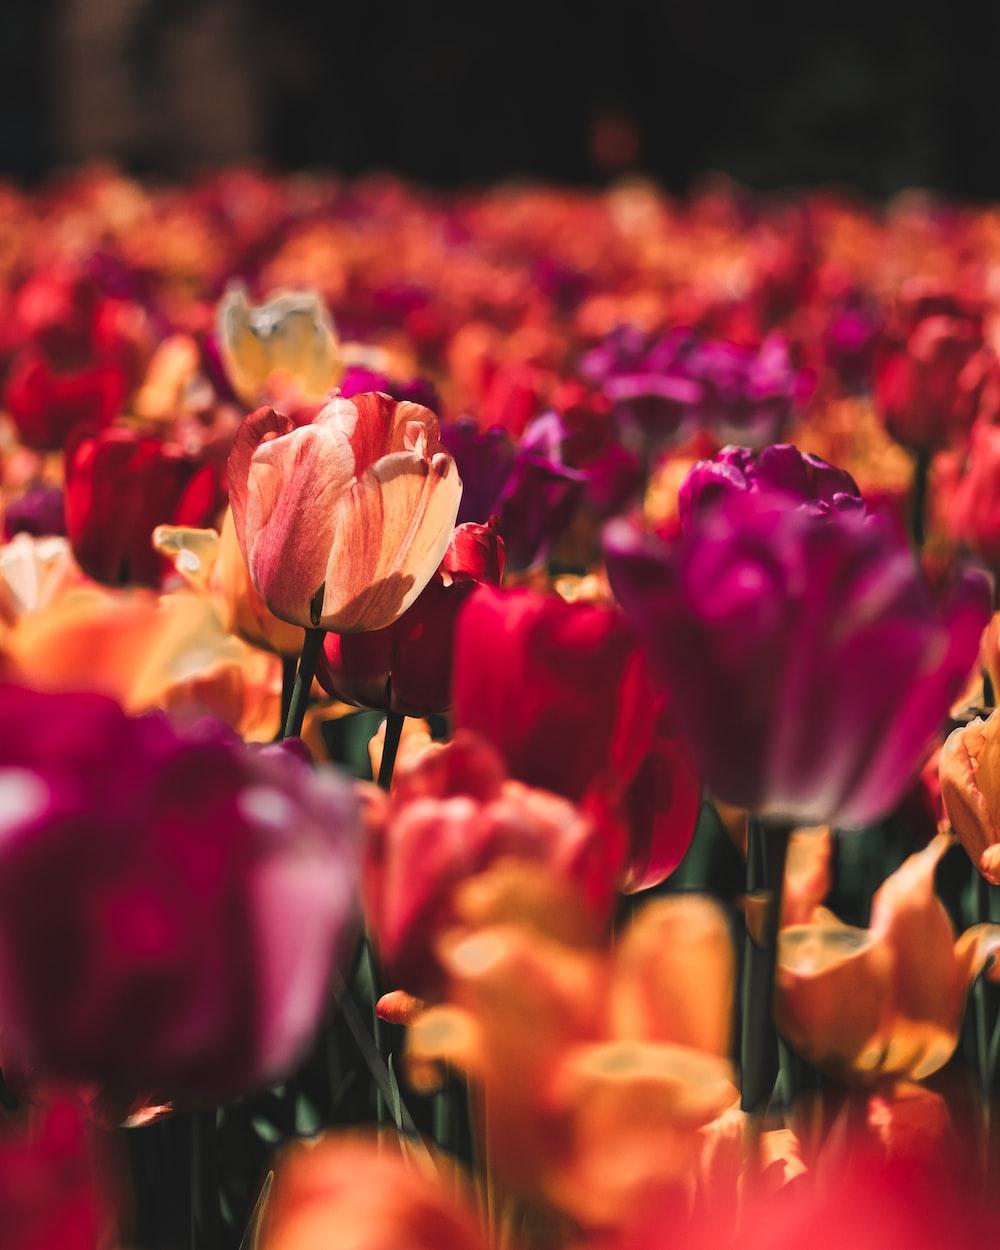 purple and orange tulip flower field